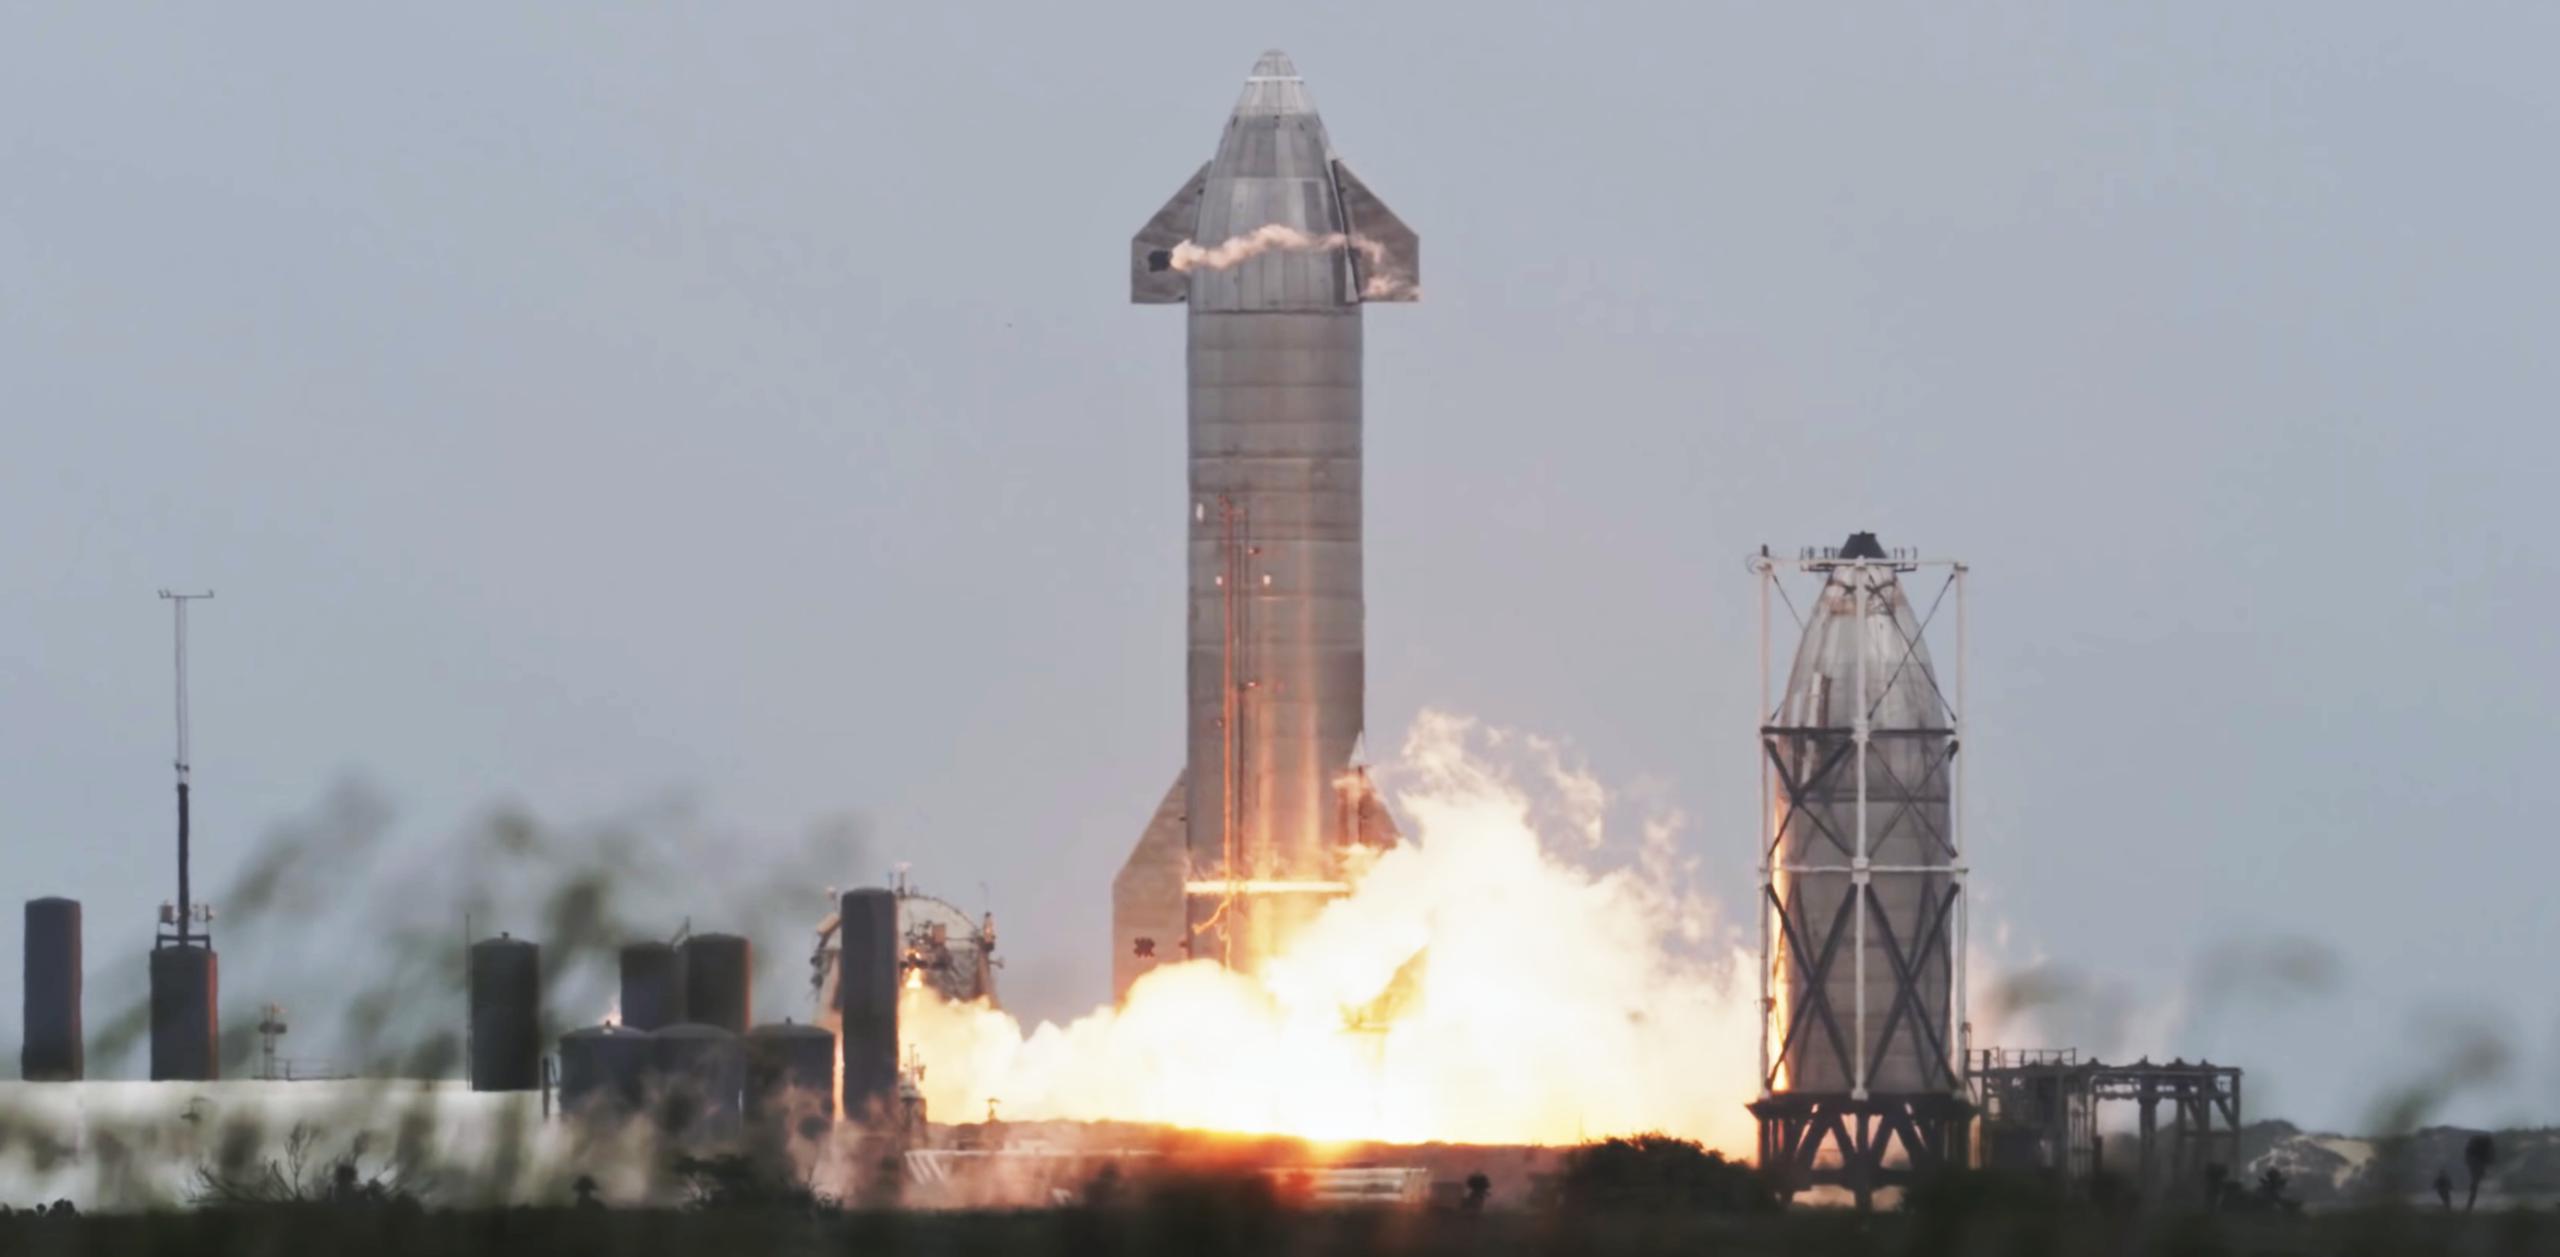 Starship SN15 10km flight test 050521 recap (SpaceX) liftoff 1 crop (c)